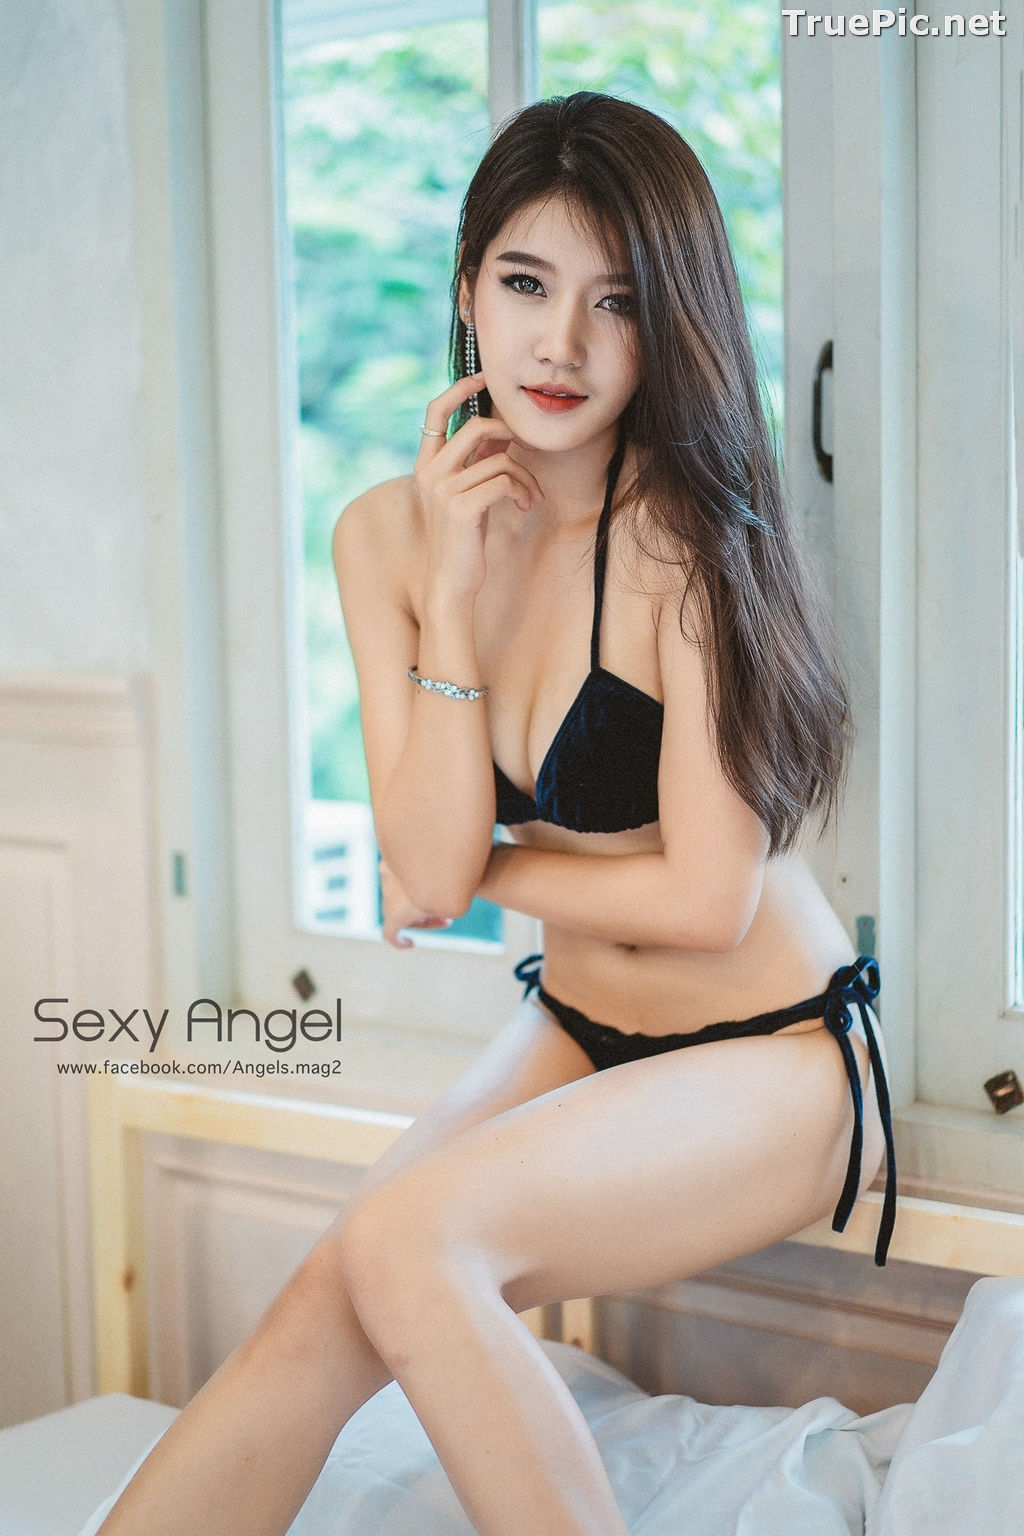 Image Thailand Model - Saruda Chalermsaen (EveAva) - Sexy Bikini Angel - TruePic.net - Picture-13